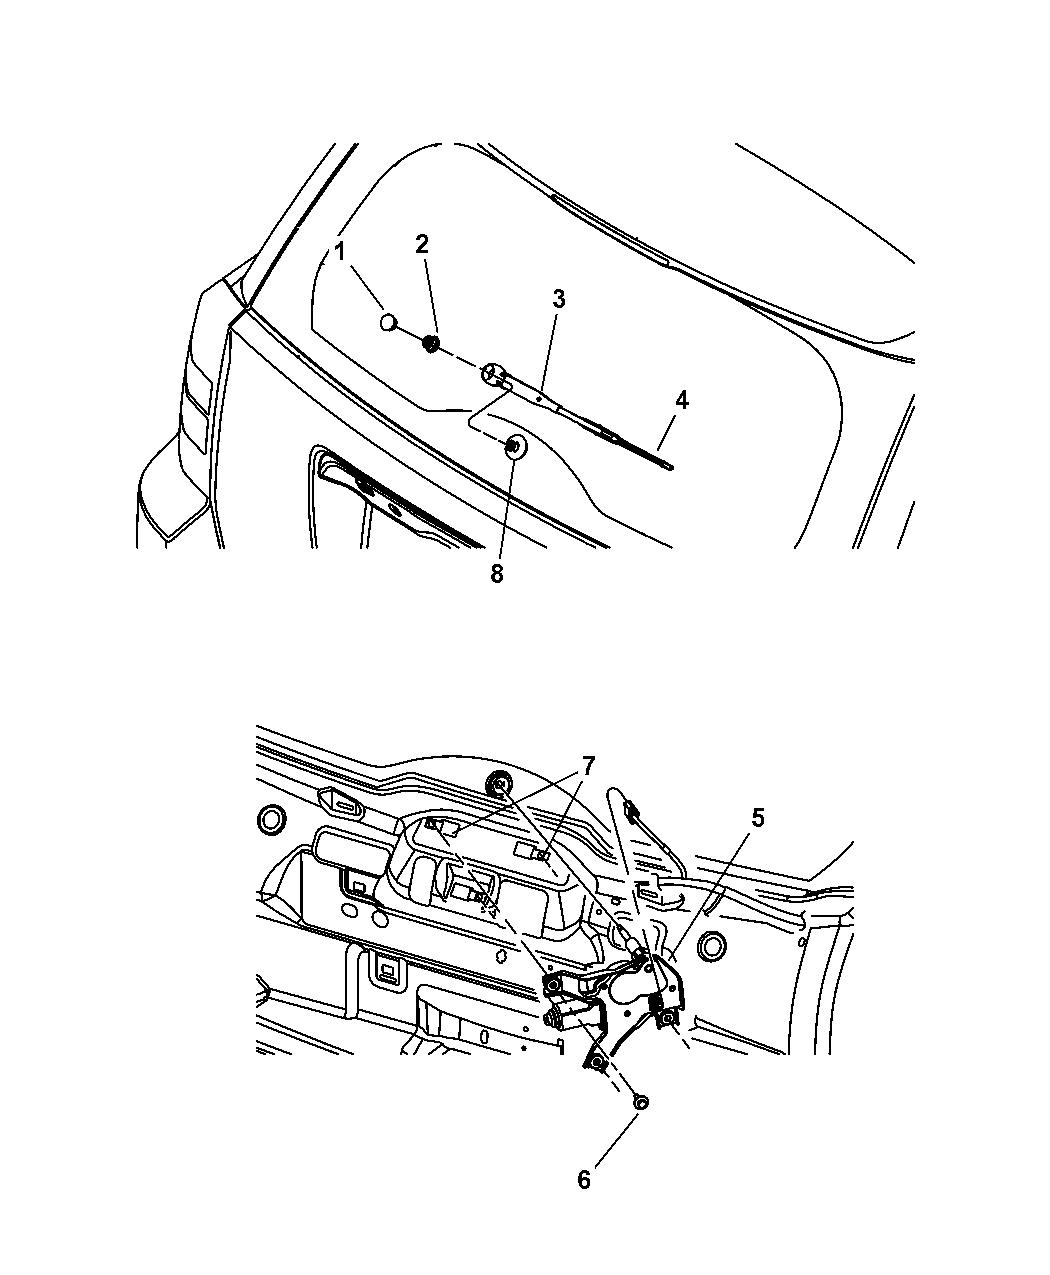 2012 jeep patriot rear wiper system mopar parts giant. Black Bedroom Furniture Sets. Home Design Ideas